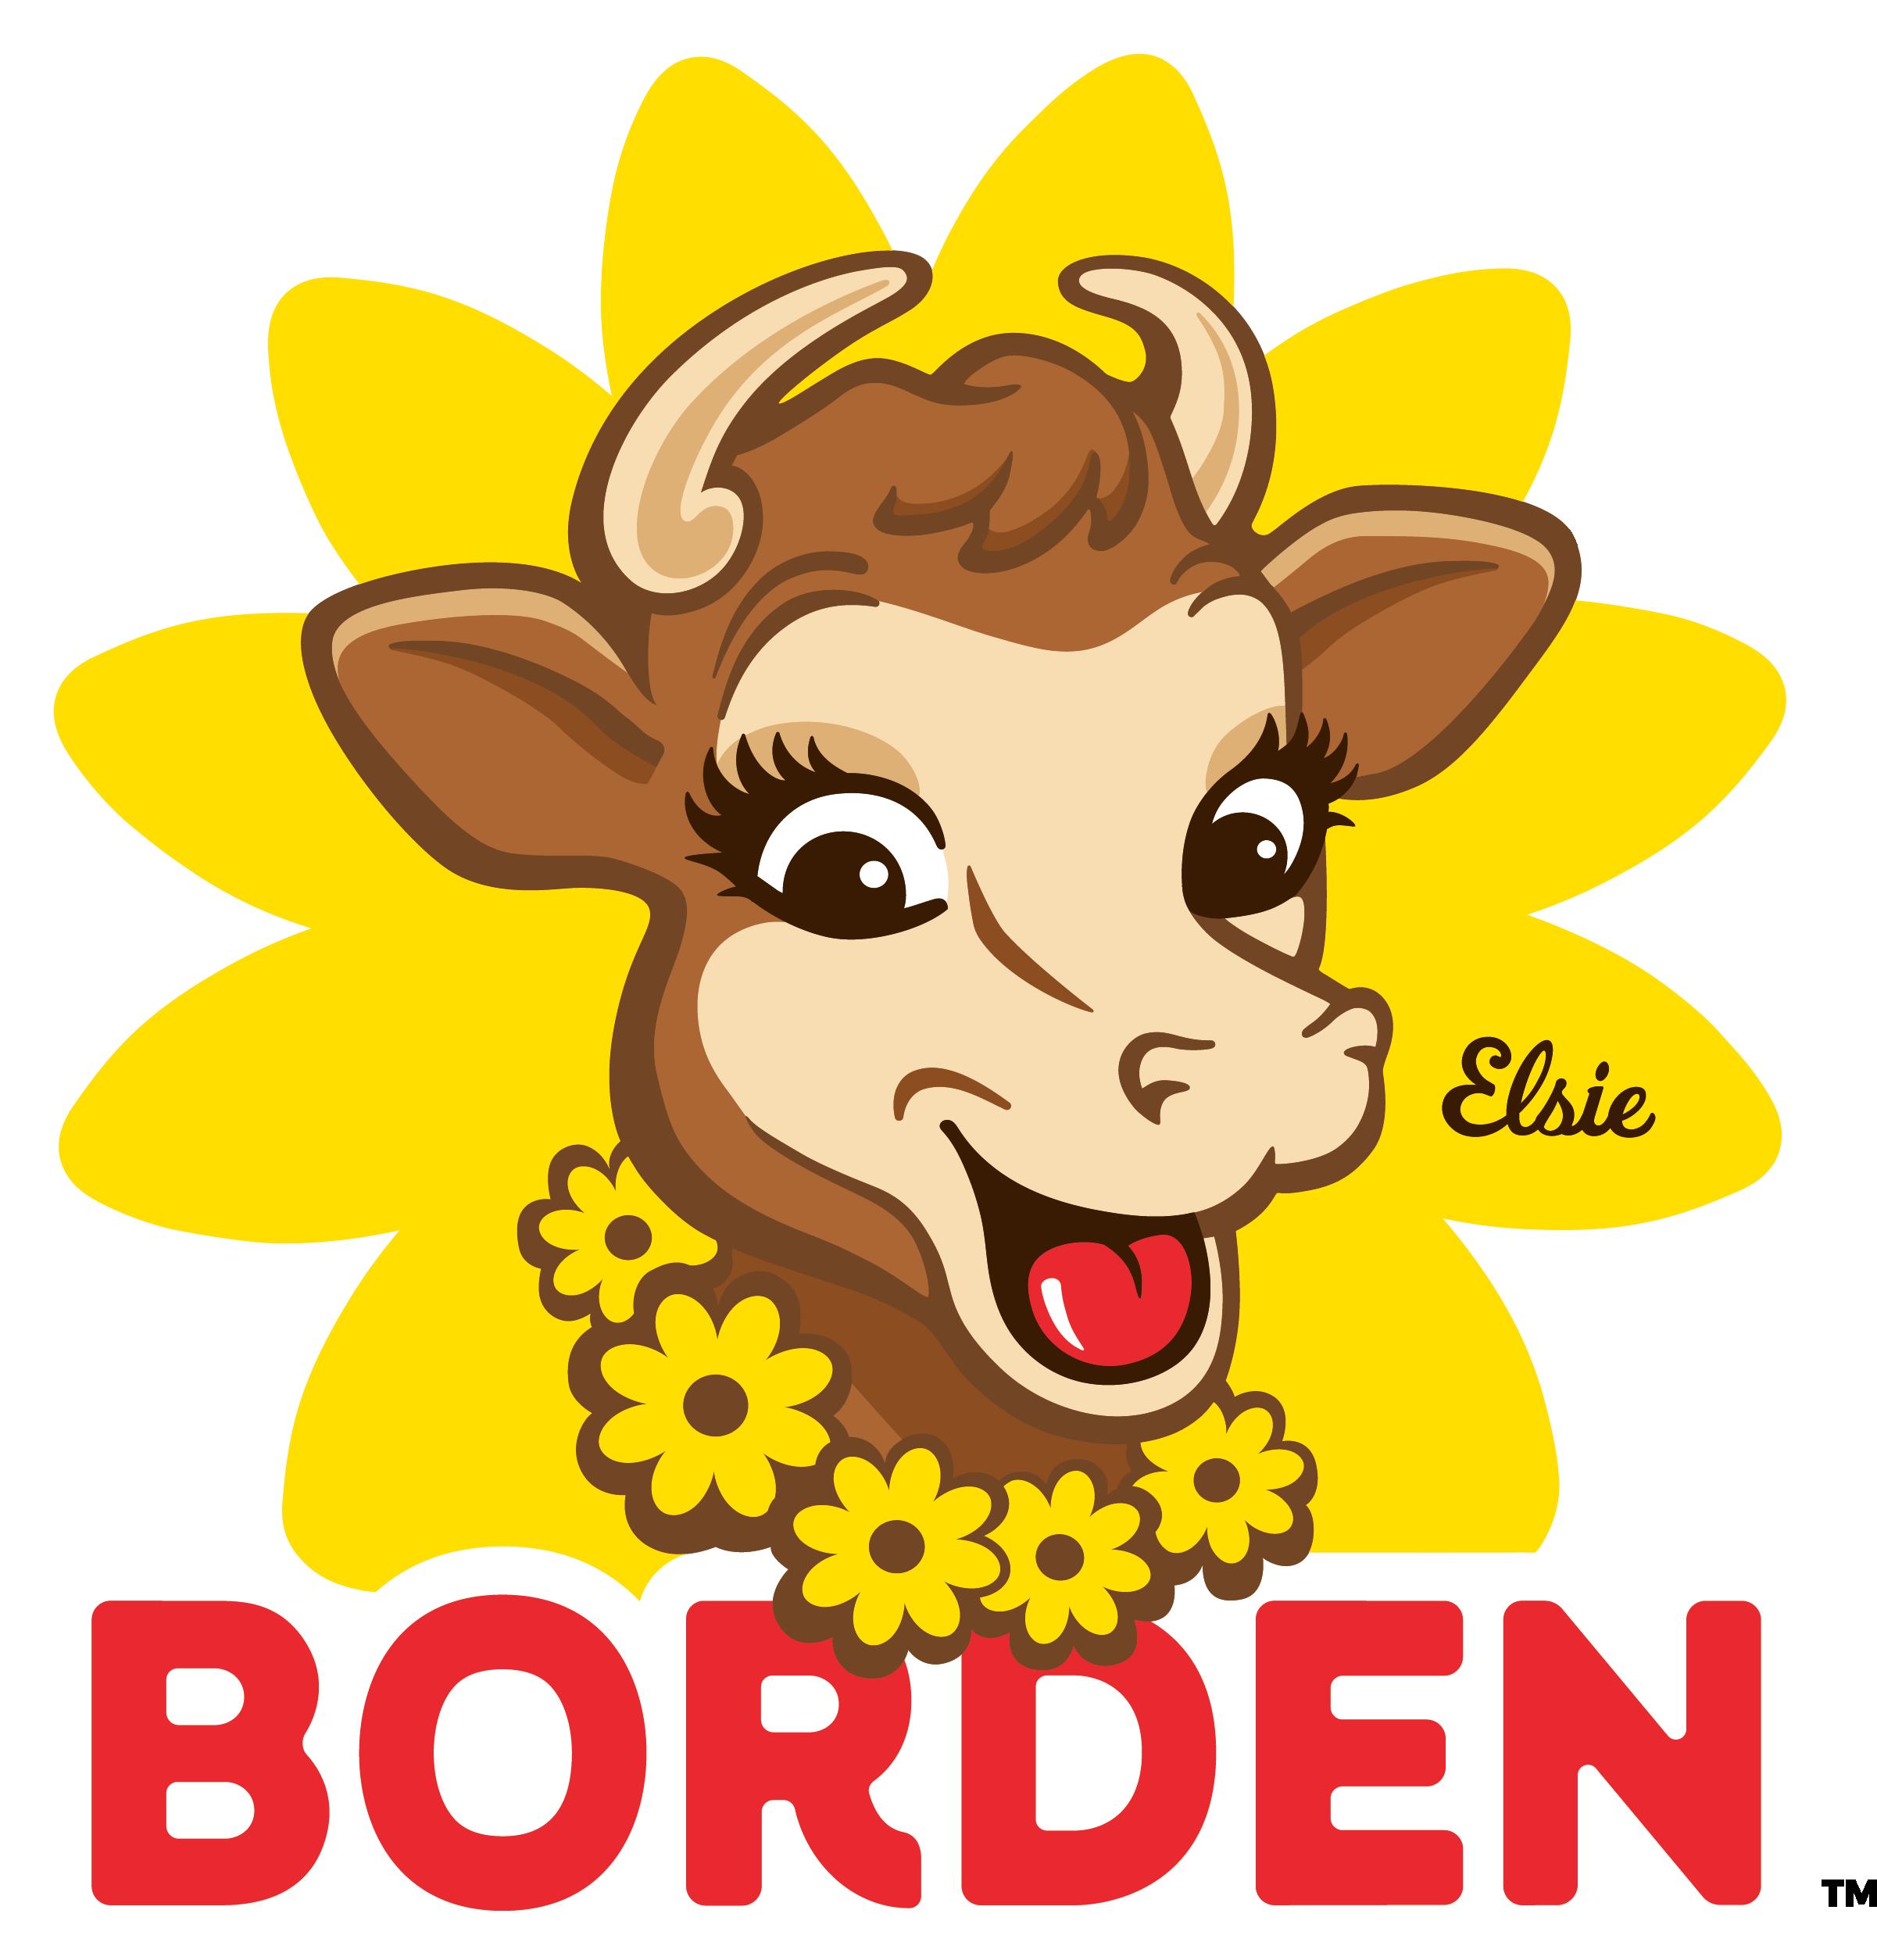 Borden_Logo_Square.png